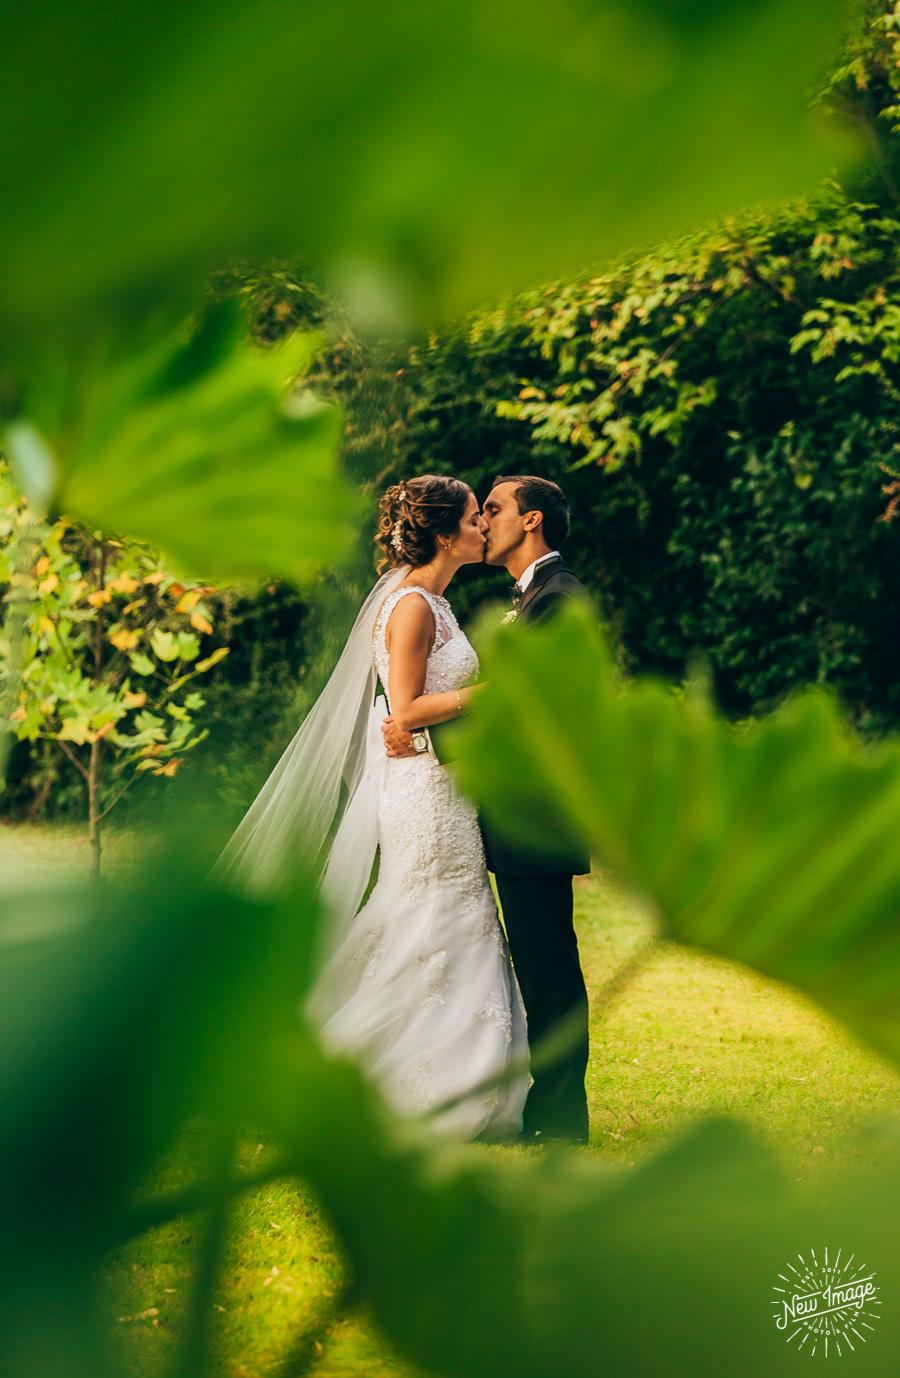 31-meli-edu-casamiento-boda-new-image-la-quinta-de-bella-vista-fotografia-video-cinematografia-de-bodas-2